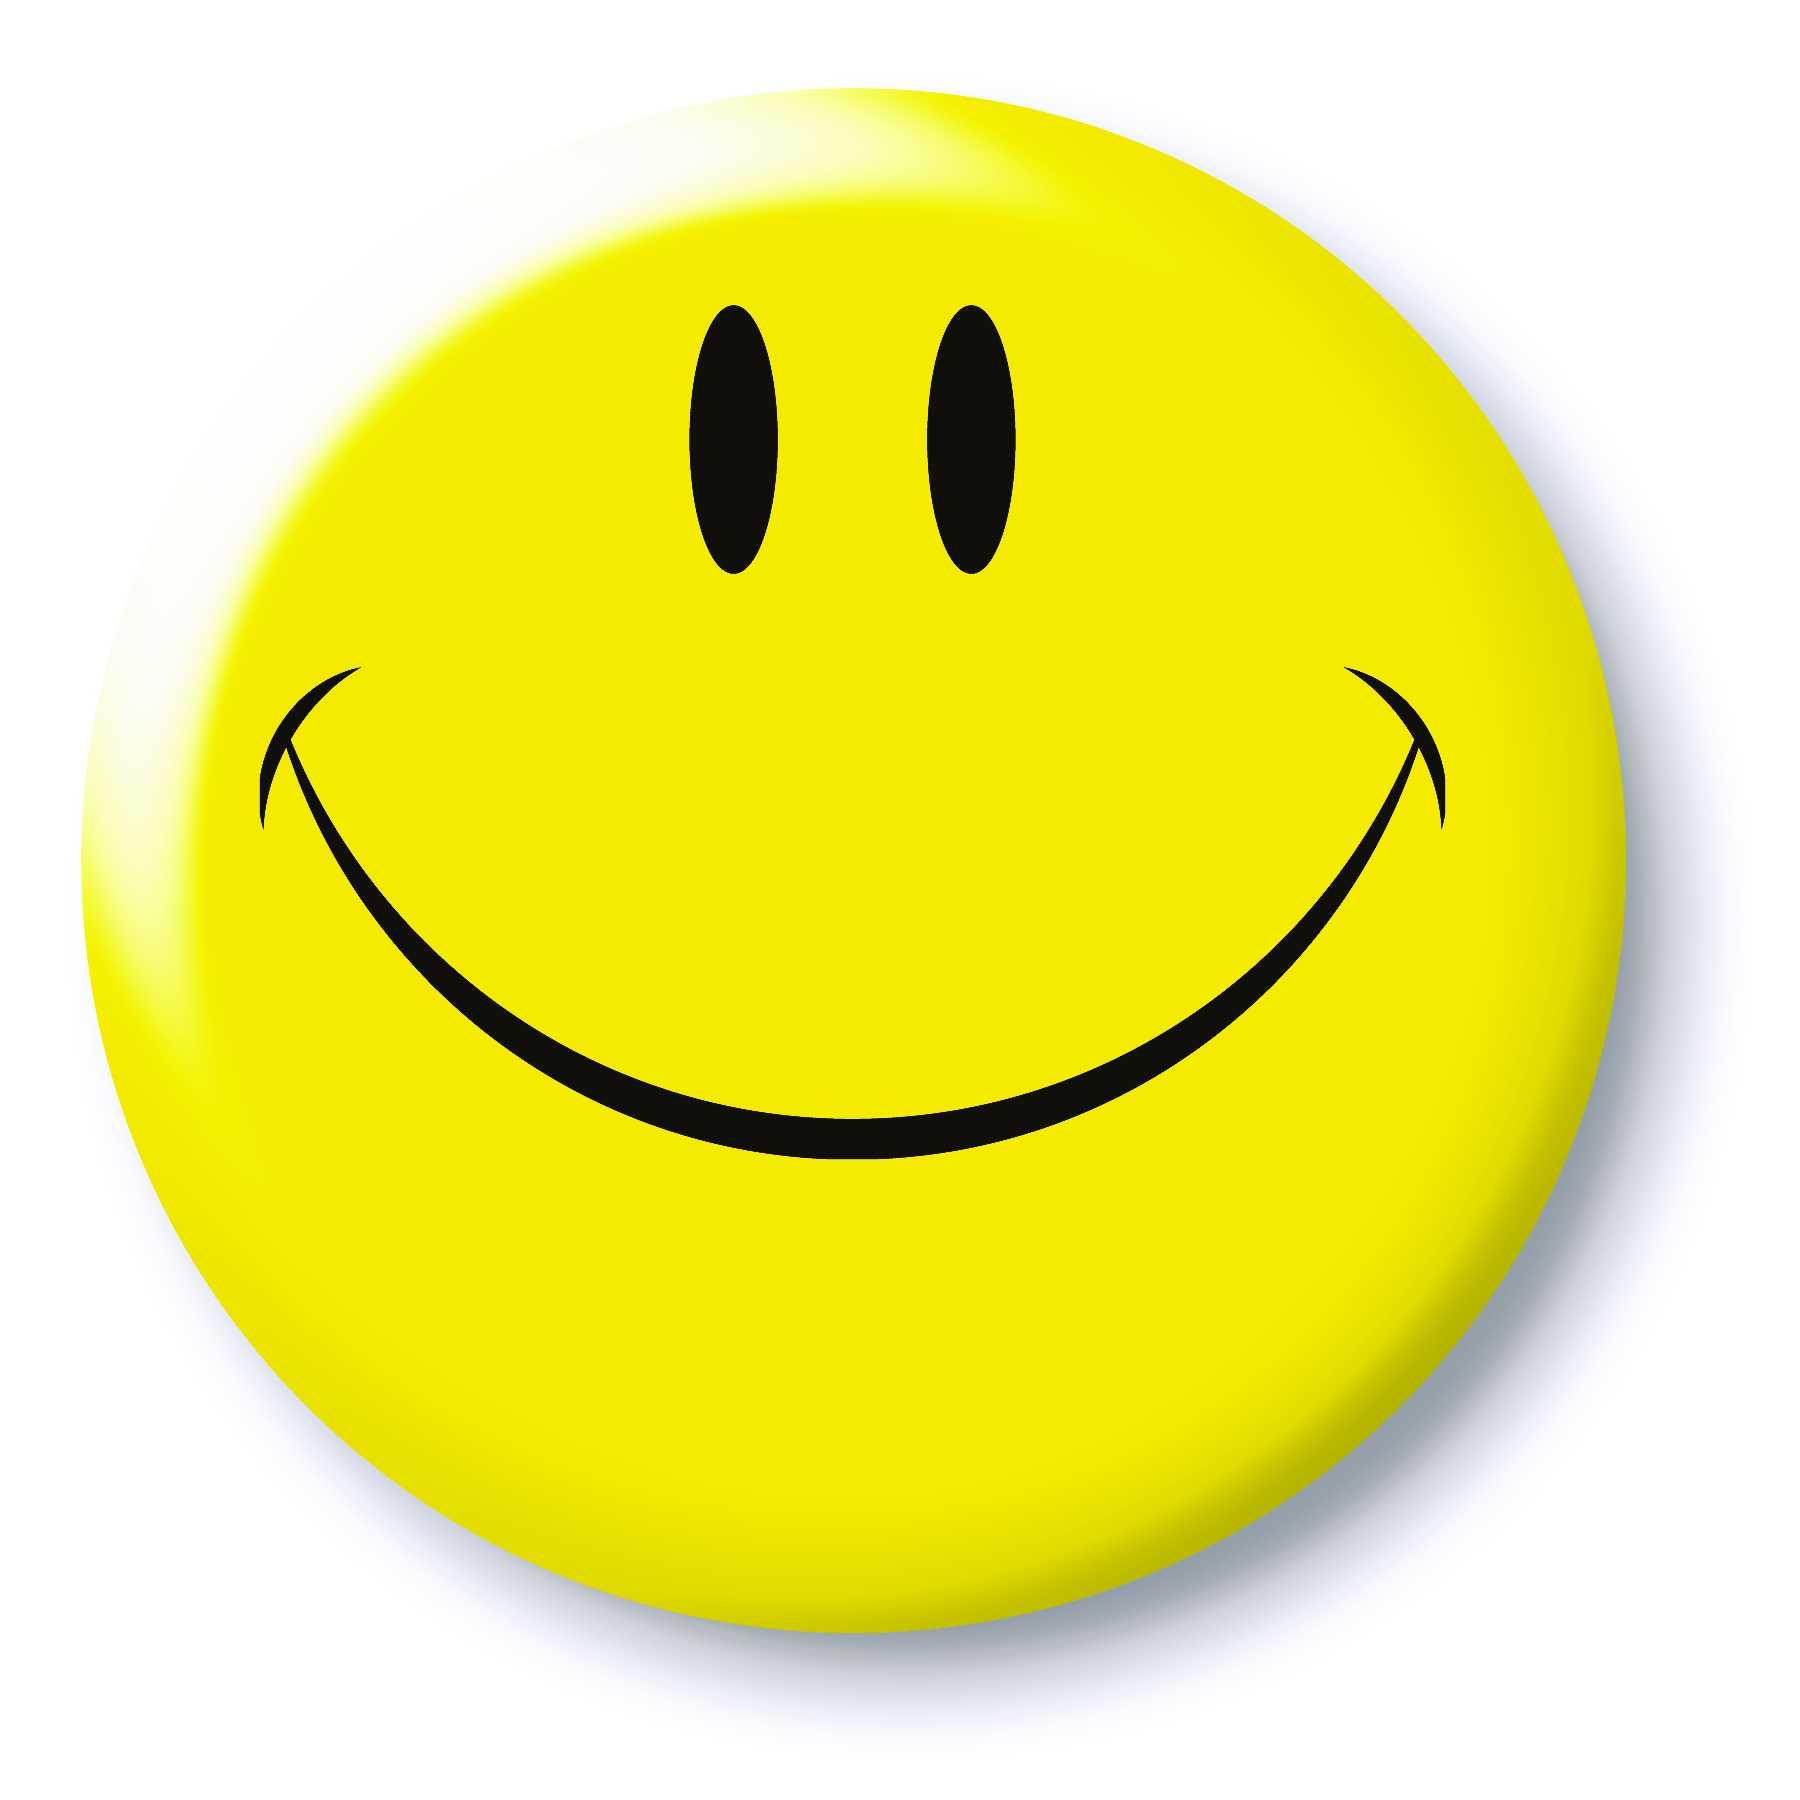 Smiley face flat jpg